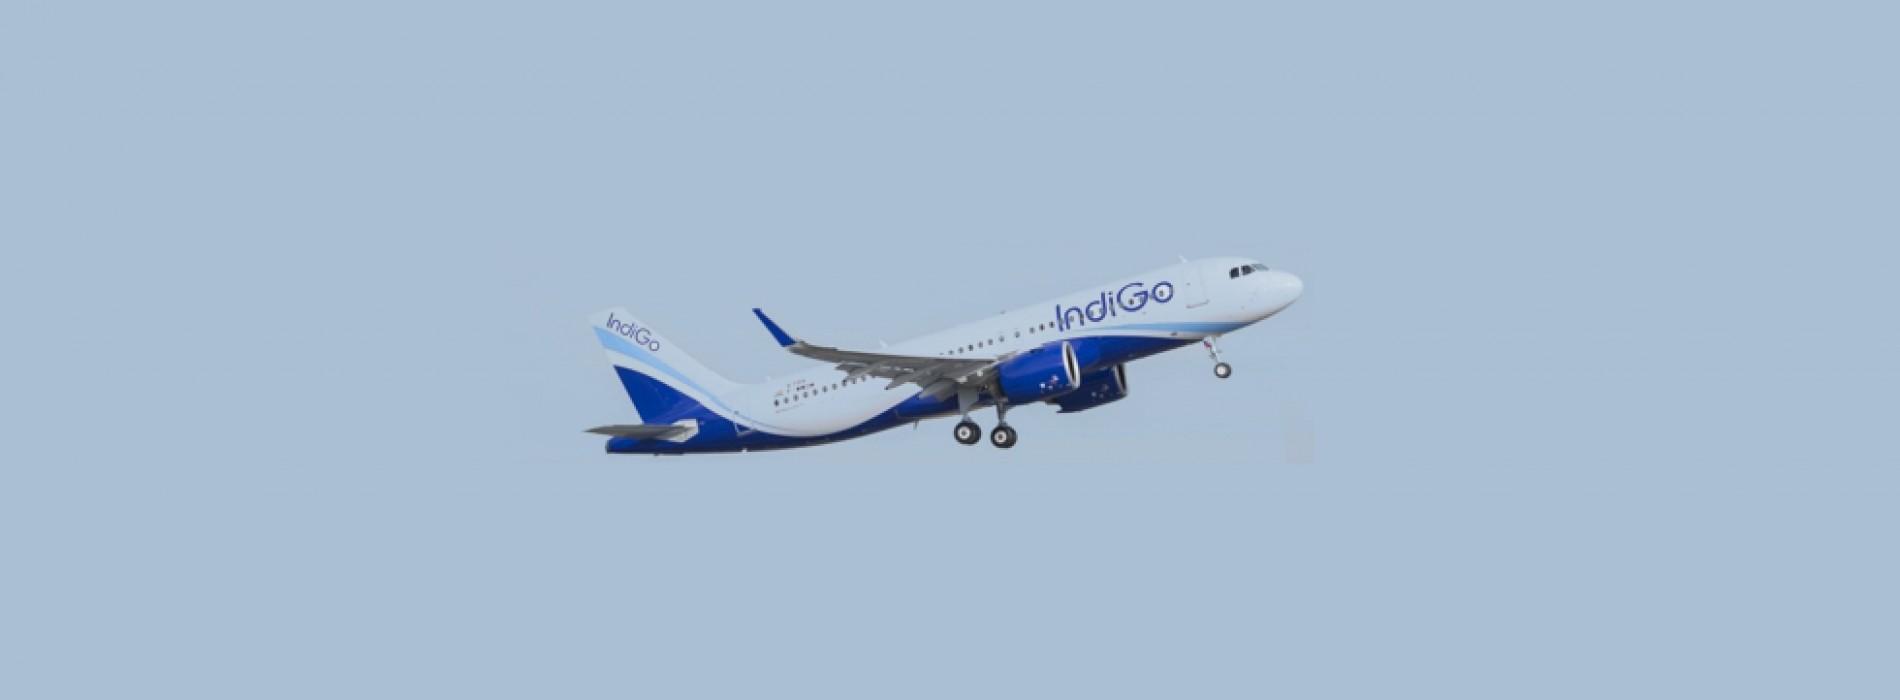 IndiGo cancels 84 flights, grounds planes over engine issue